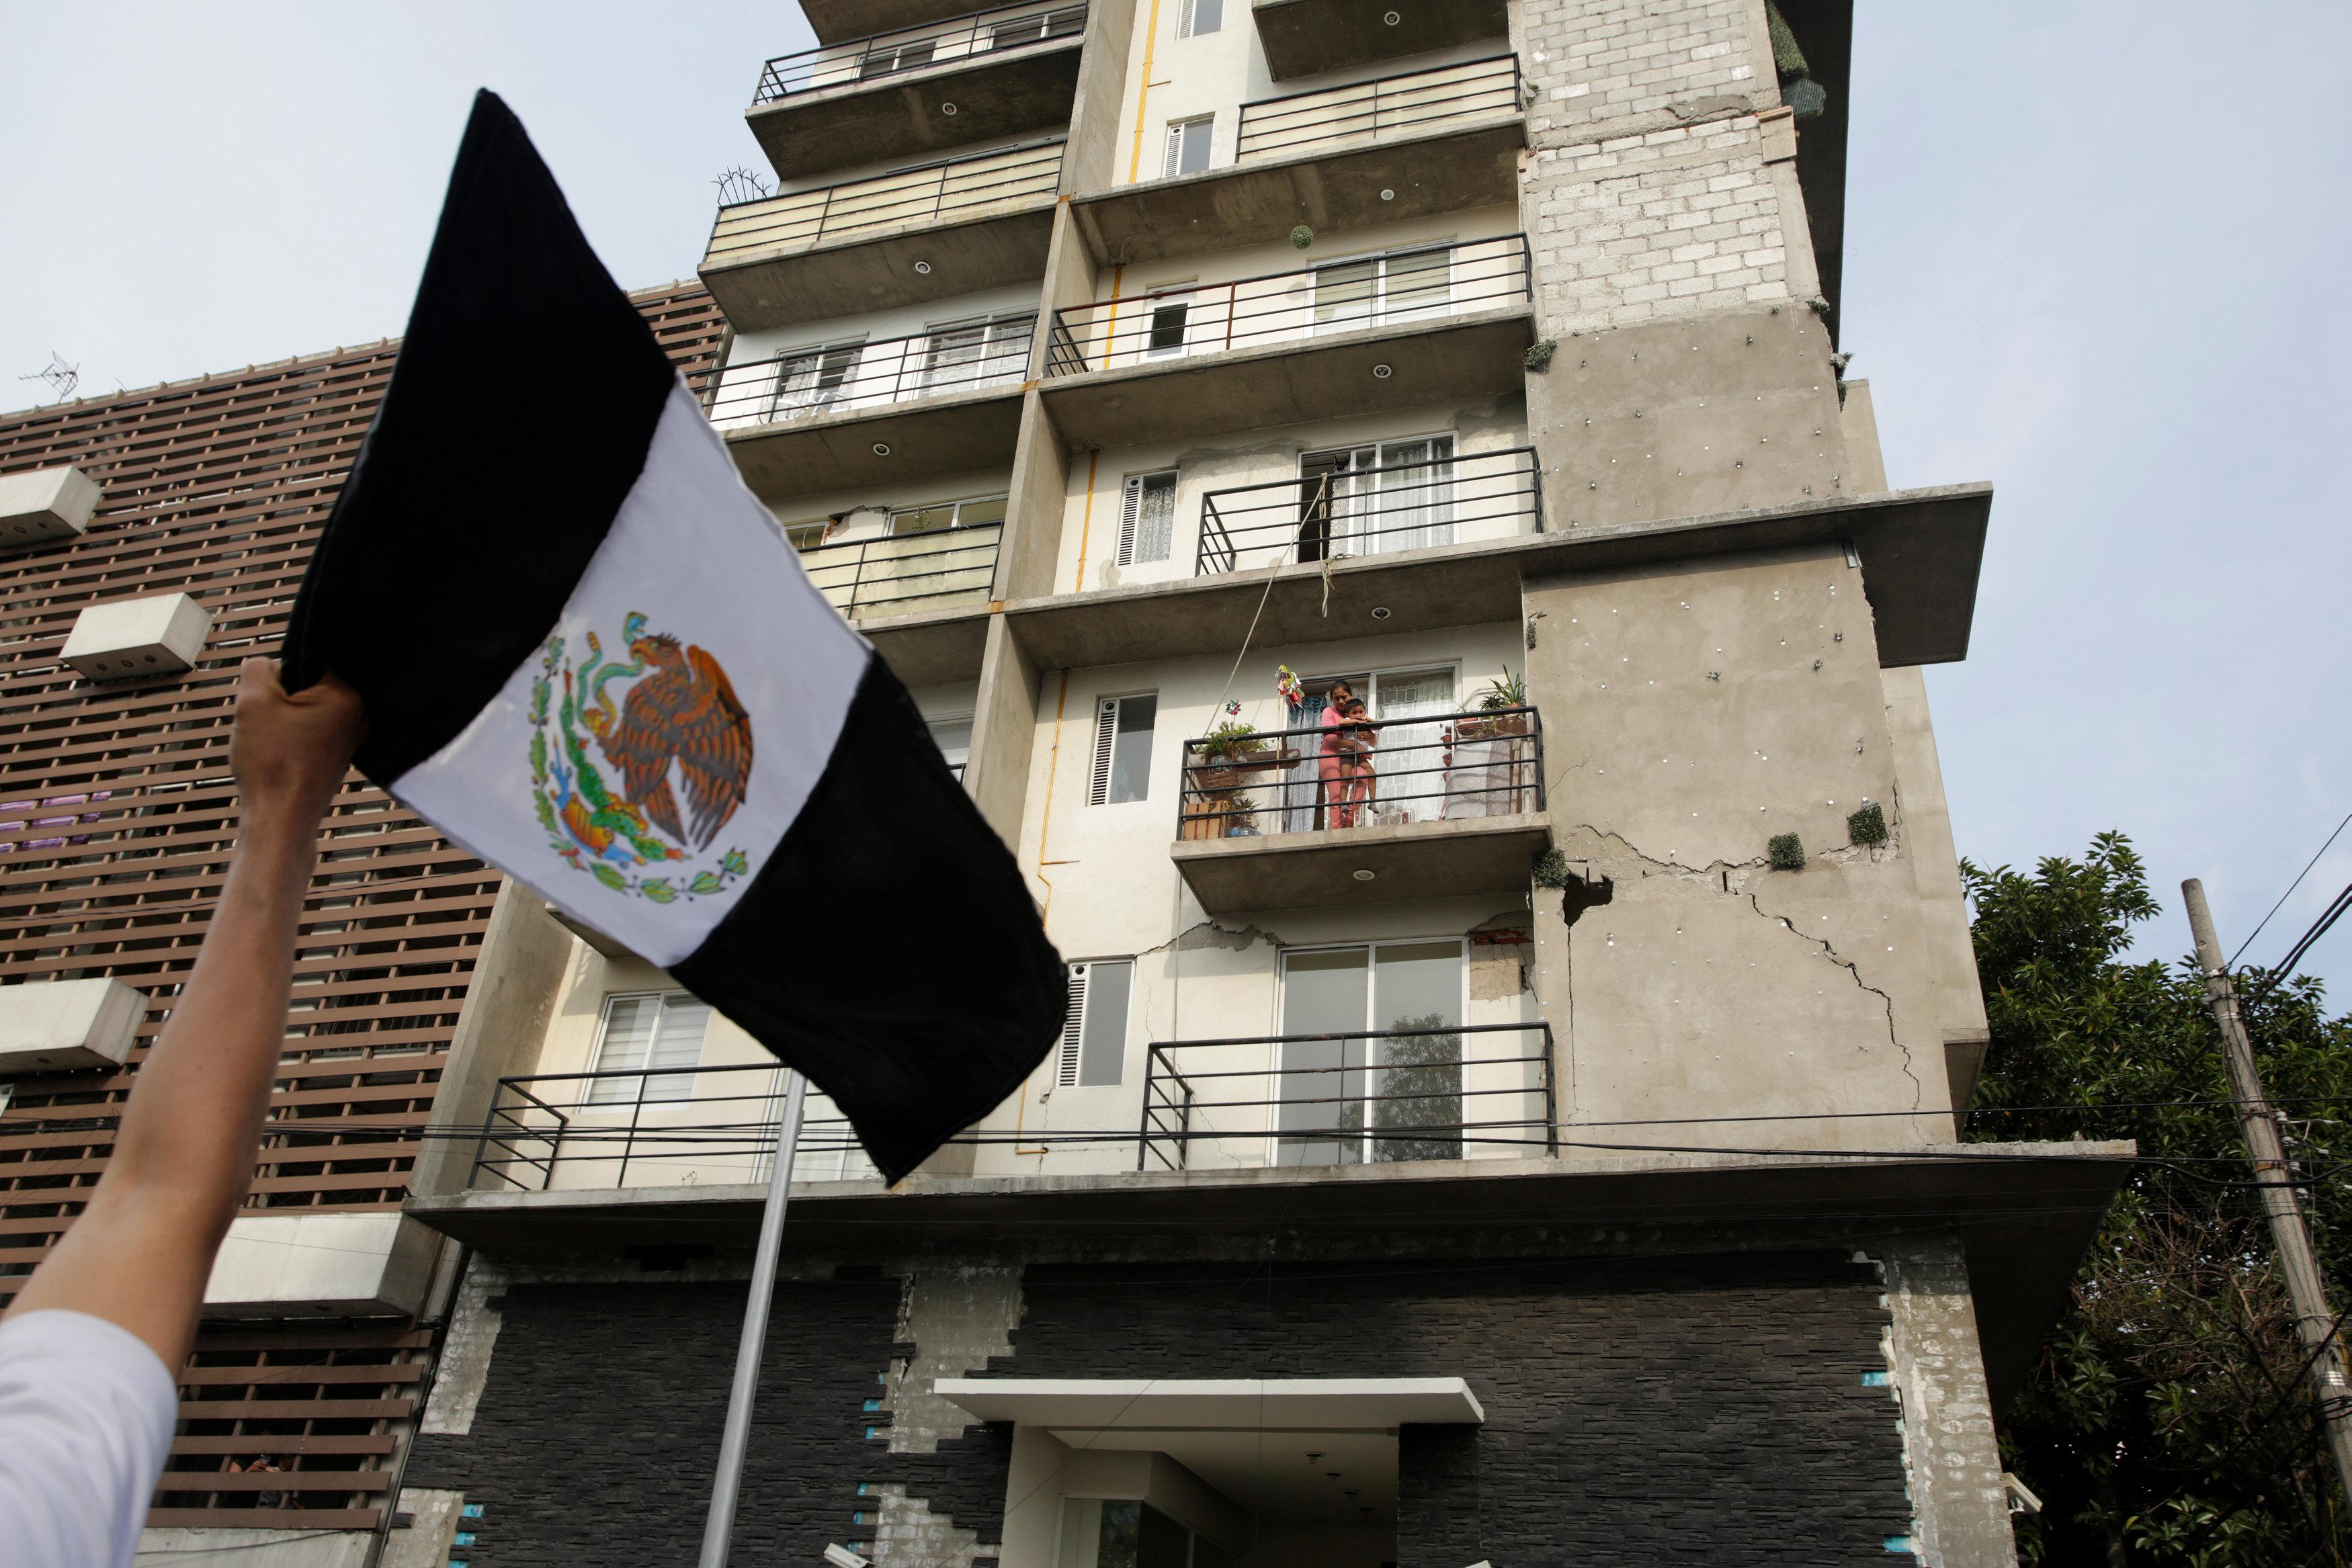 Se vence plazo para reportar viviendas dañadas del Infonavit